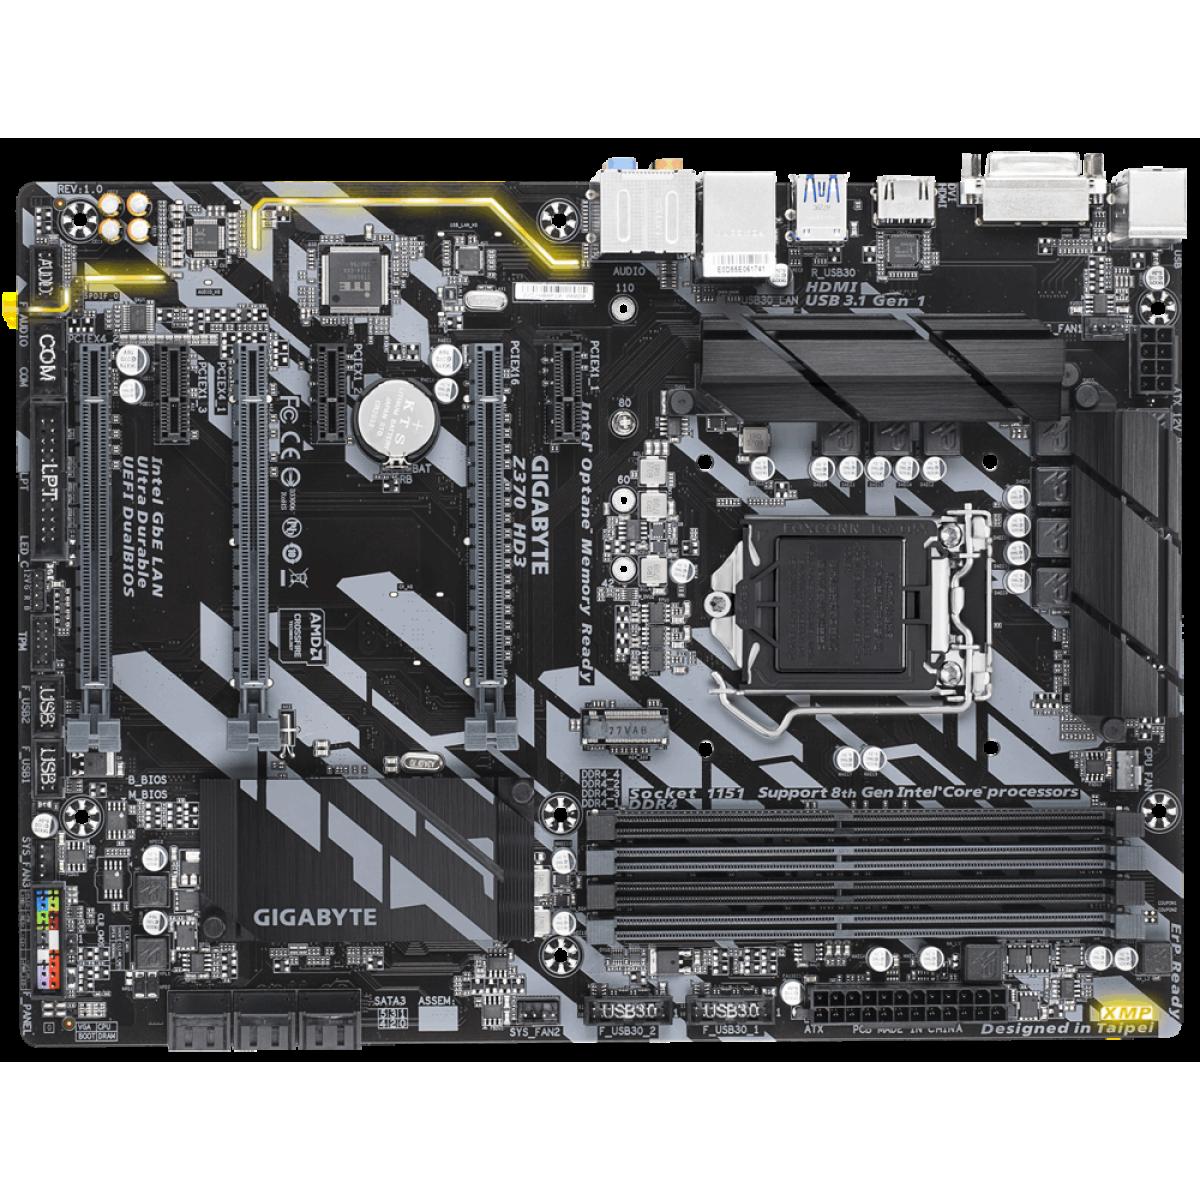 Placa Mãe Gigabyte Z370 HD3, Chipset Z370, Intel LGA 1151, ATX, DDR4